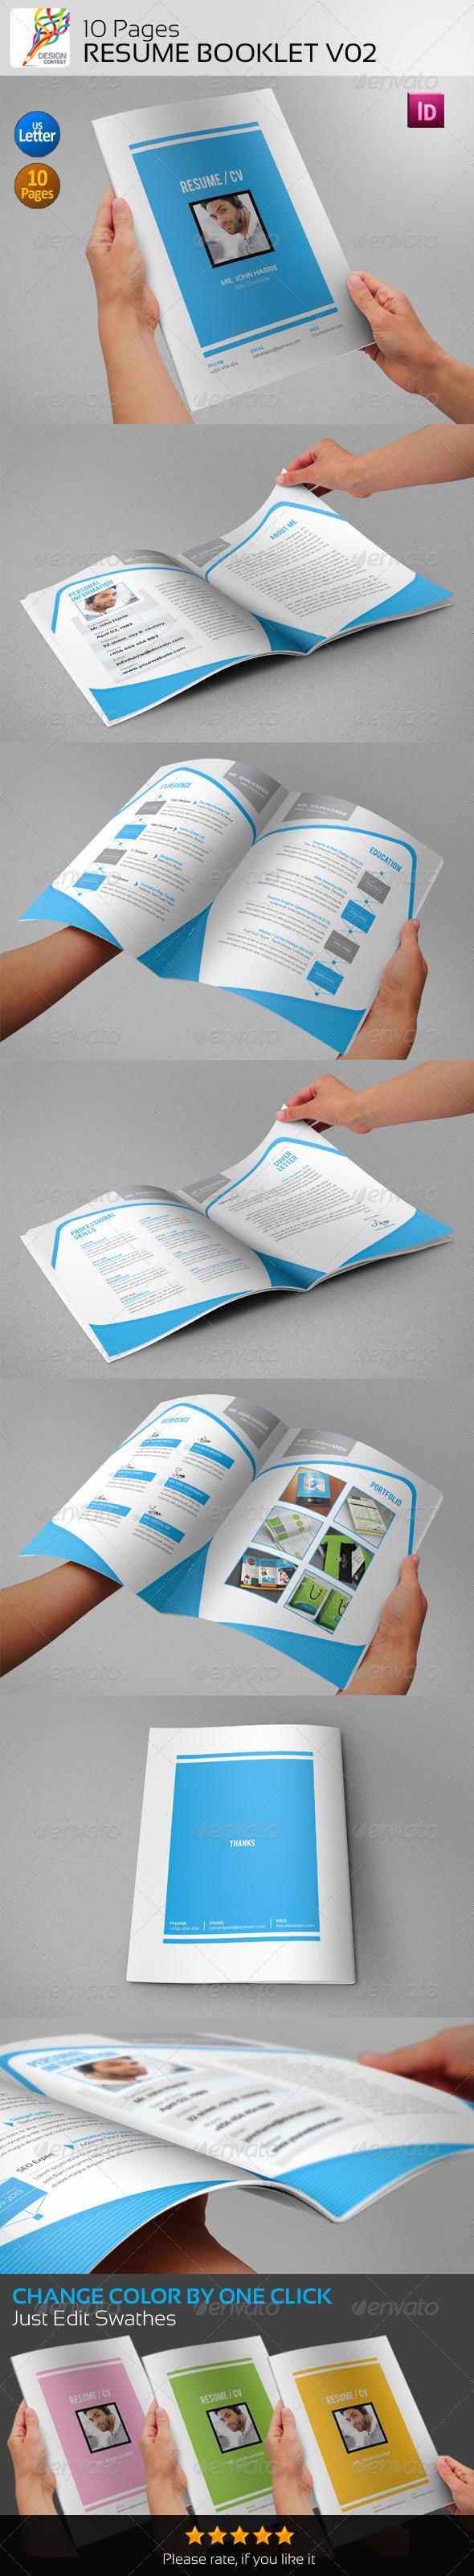 GraphicRiver 10 Pages Resume Booklet V02 5411520